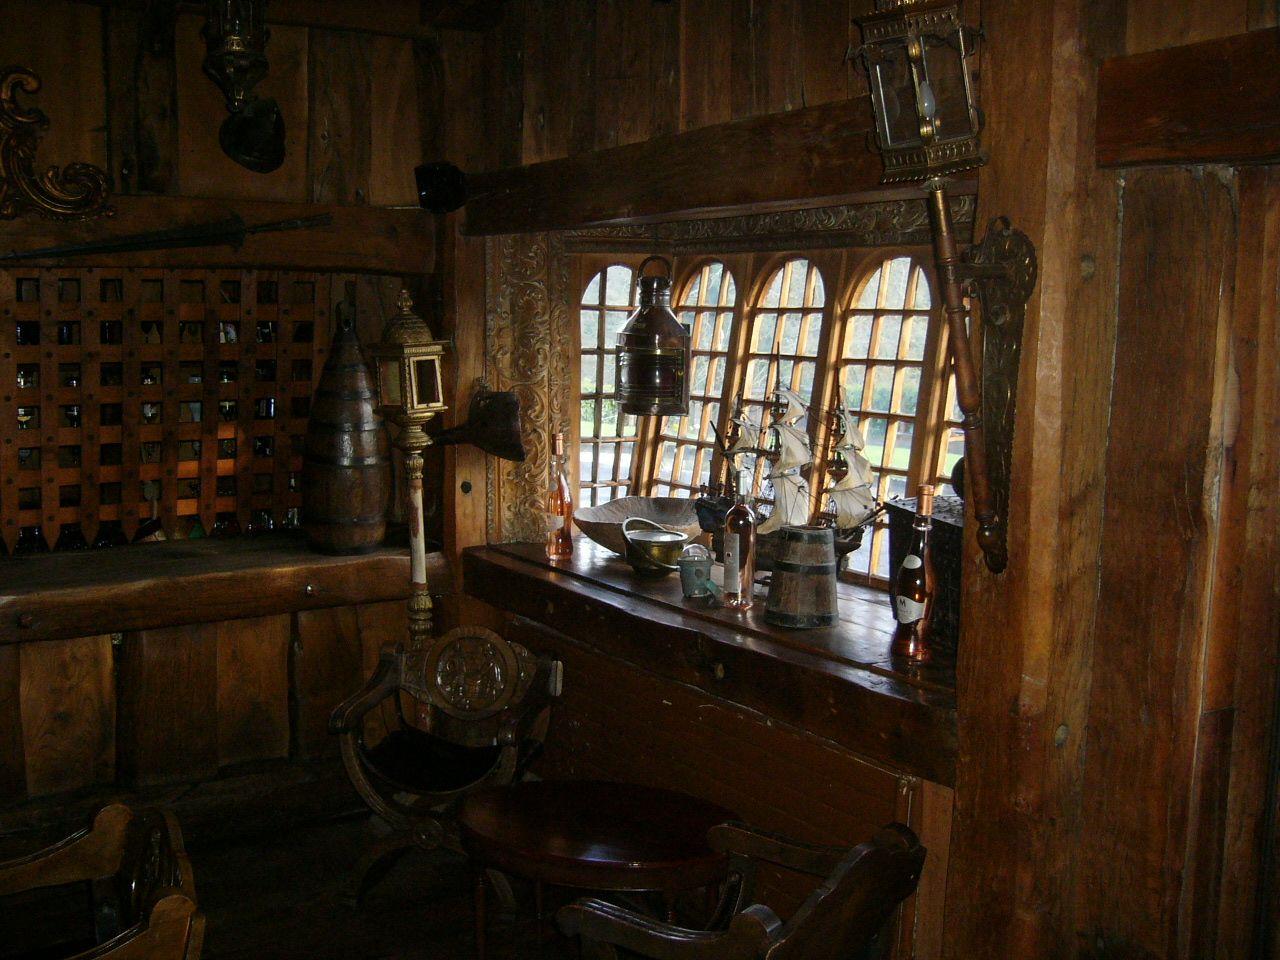 Pirate home cinema spanish armada themed galleon bar